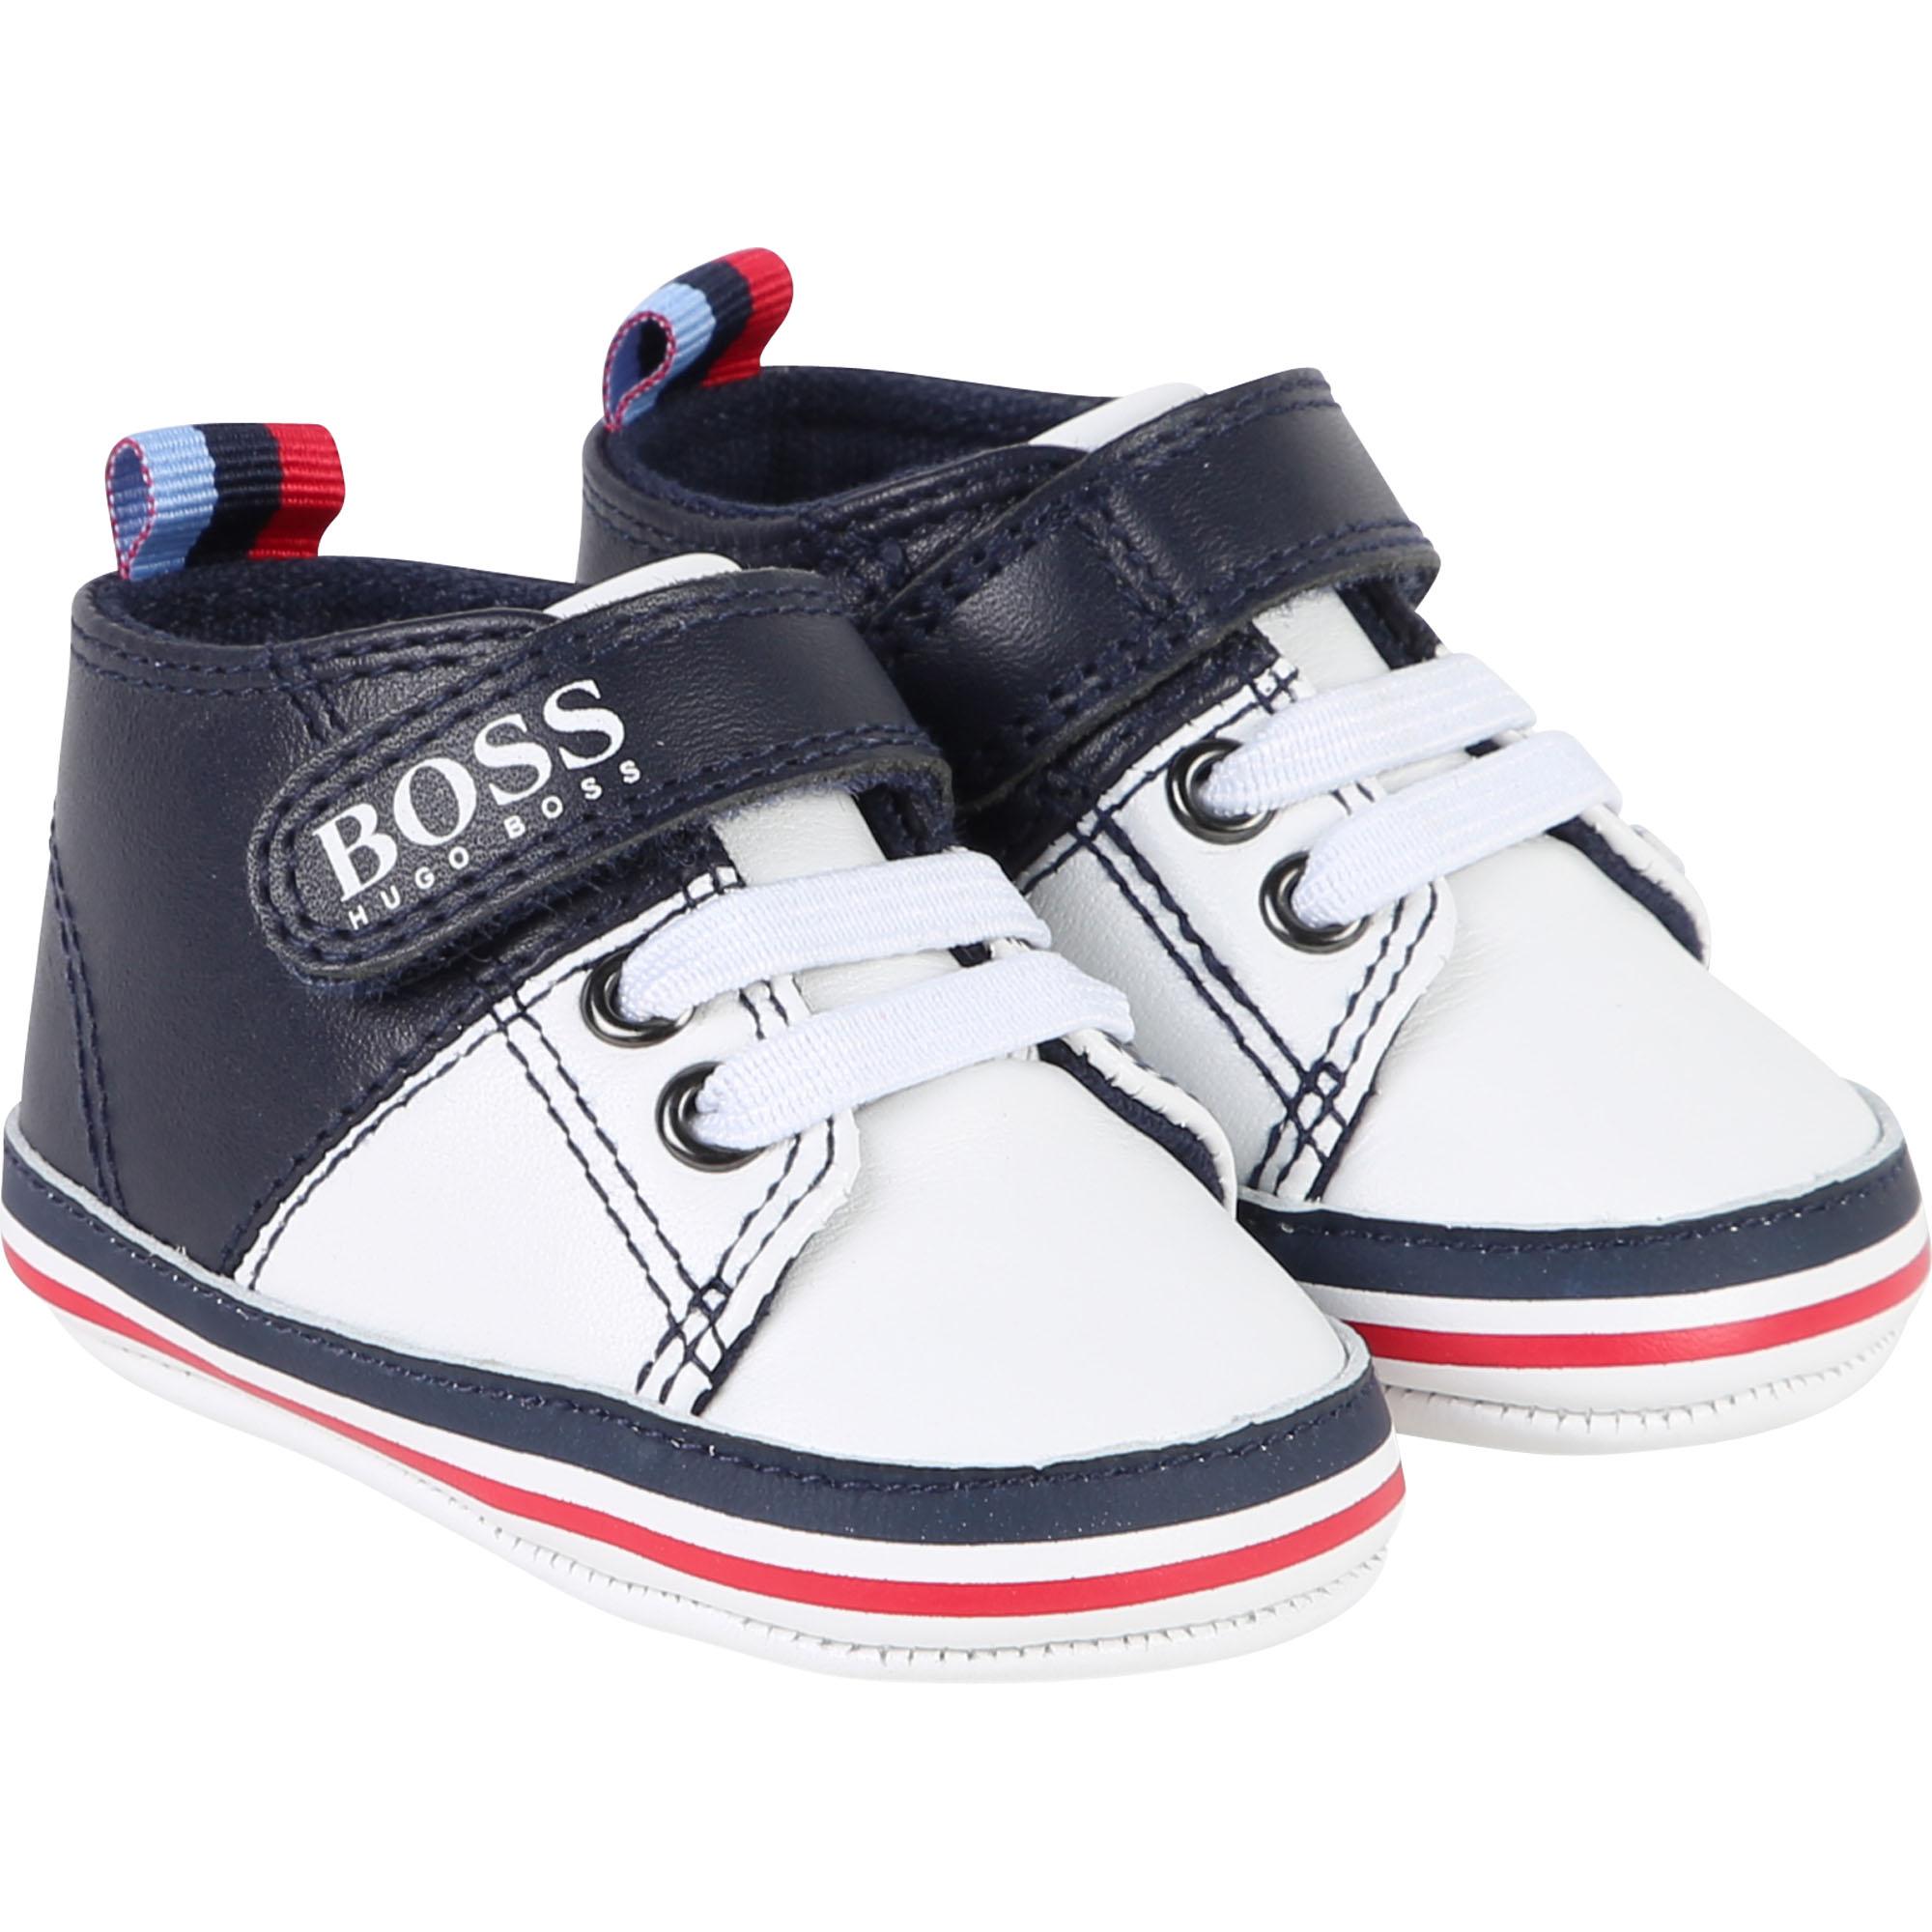 Hugo Boss Baby Sneaker aus Leder in marine-weiss